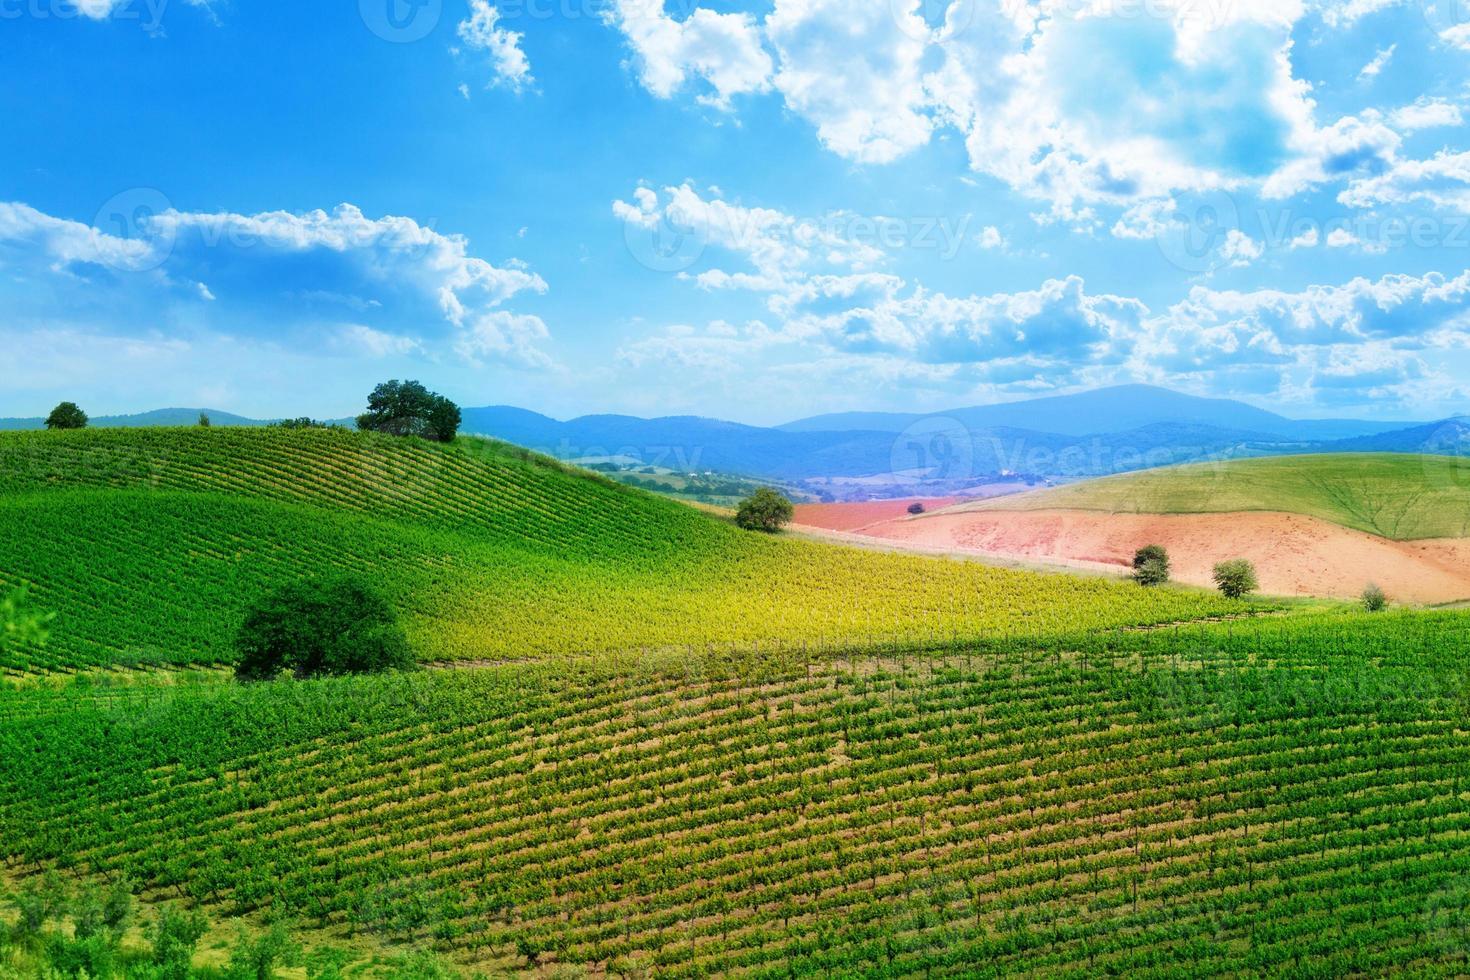 Grünes Feld mit Pflanzen in der Toskana, Italien foto